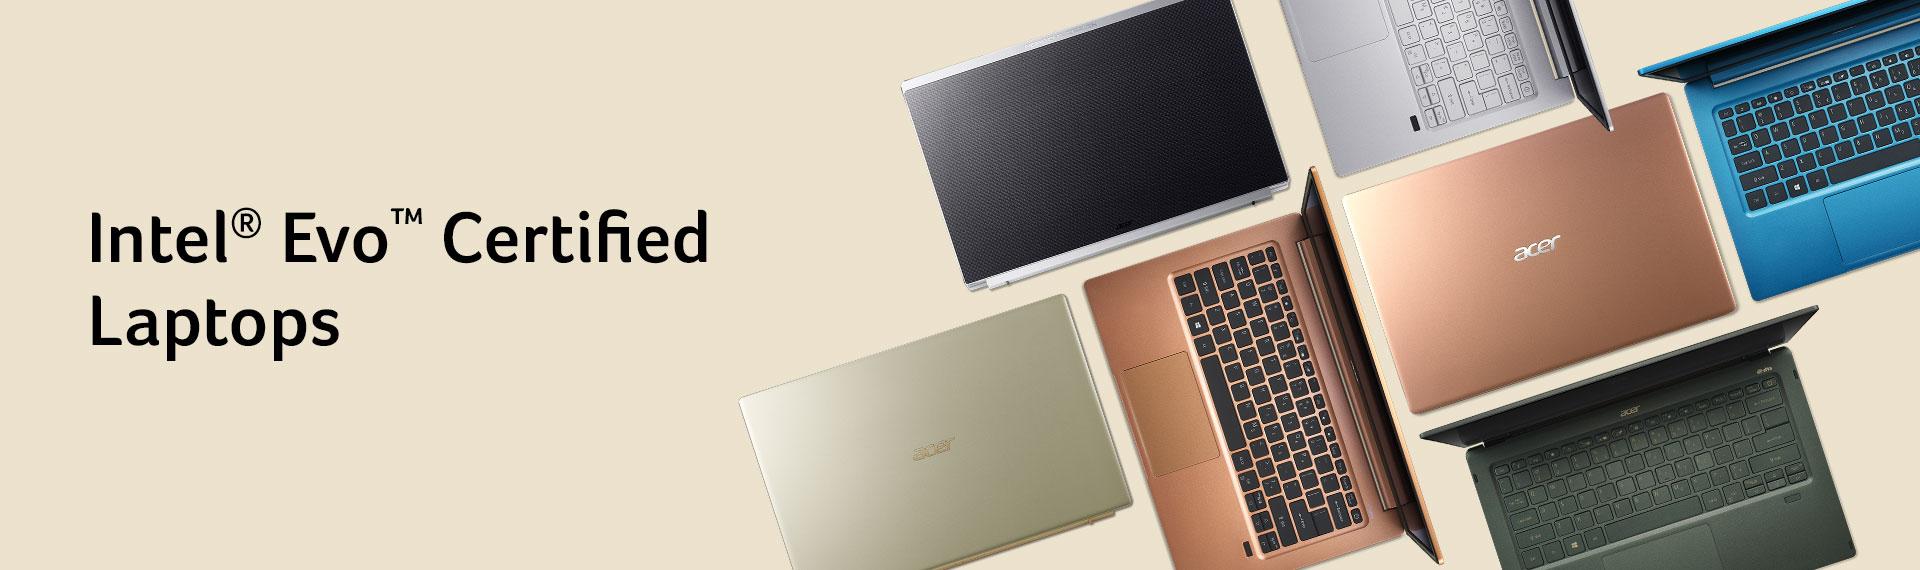 Intel® Evo™ Platform, Prosesor Terobosan Baru untuk Laptop Tipis yang Powerful